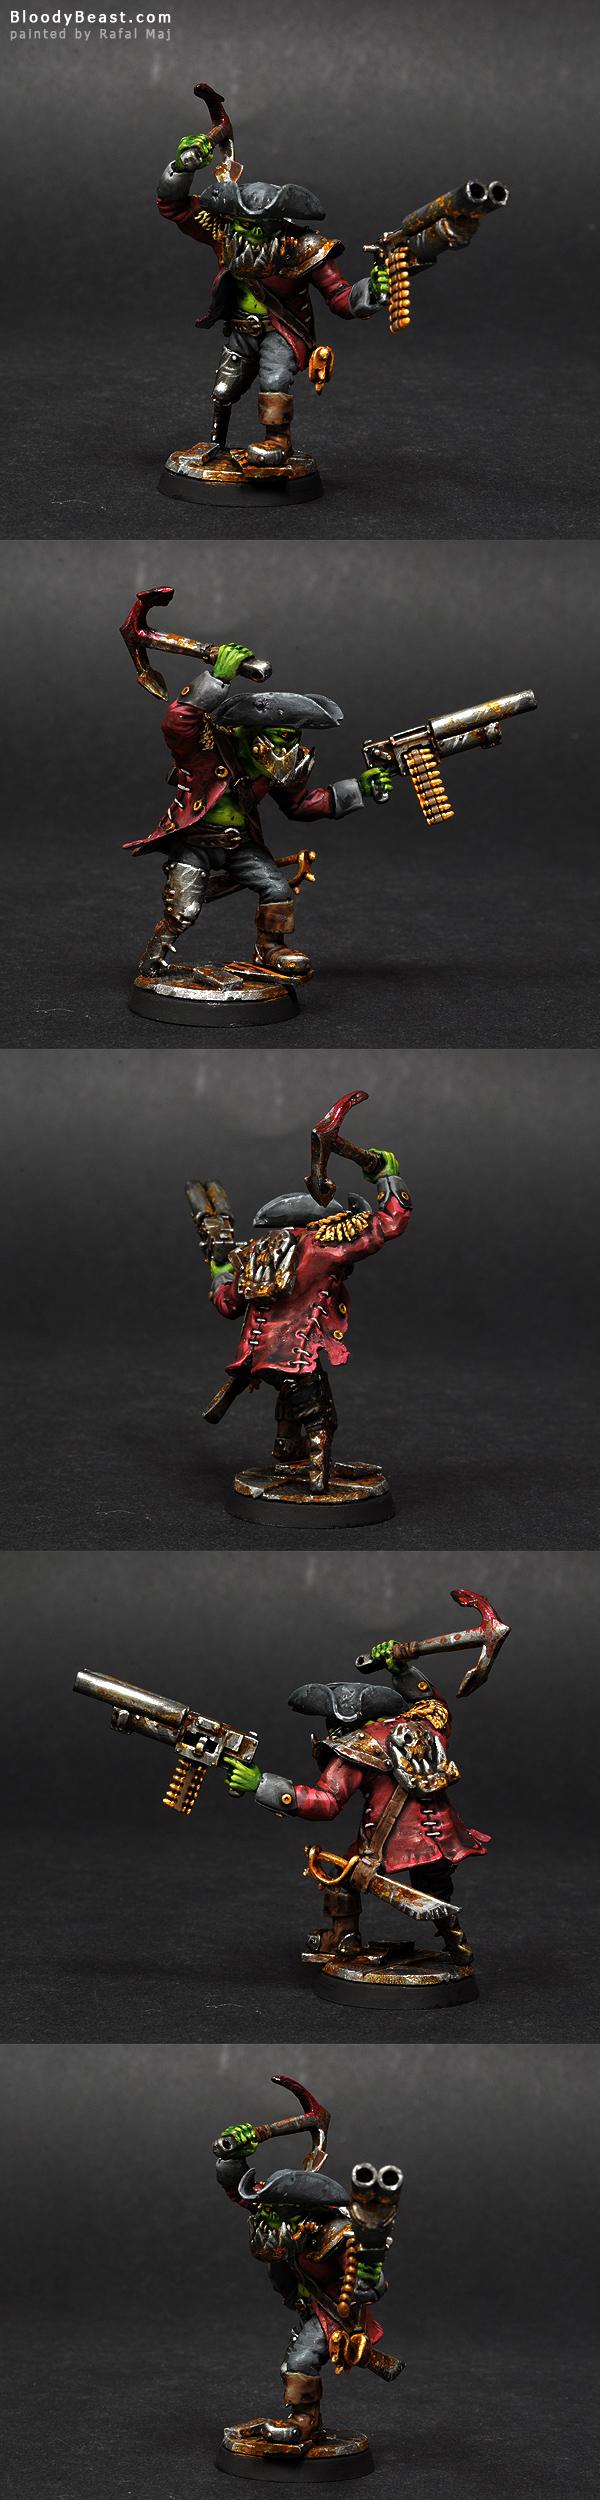 Goblinaid Freebooter Ork Nob painted by Rafal Maj (BloodyBeast.com)